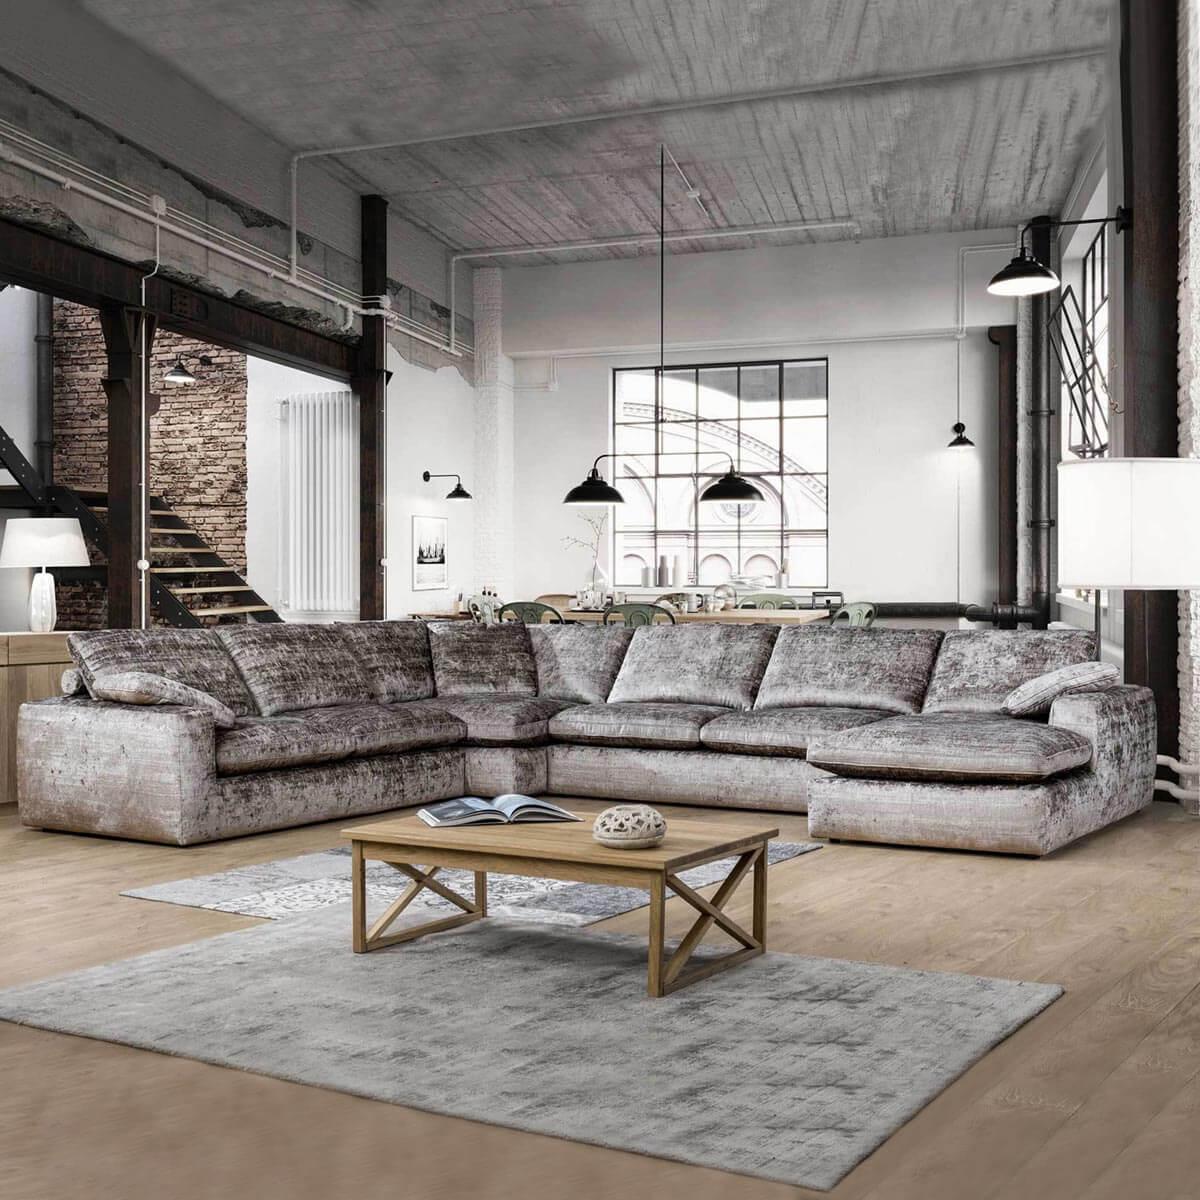 lounger-sofa-dubai-the-one